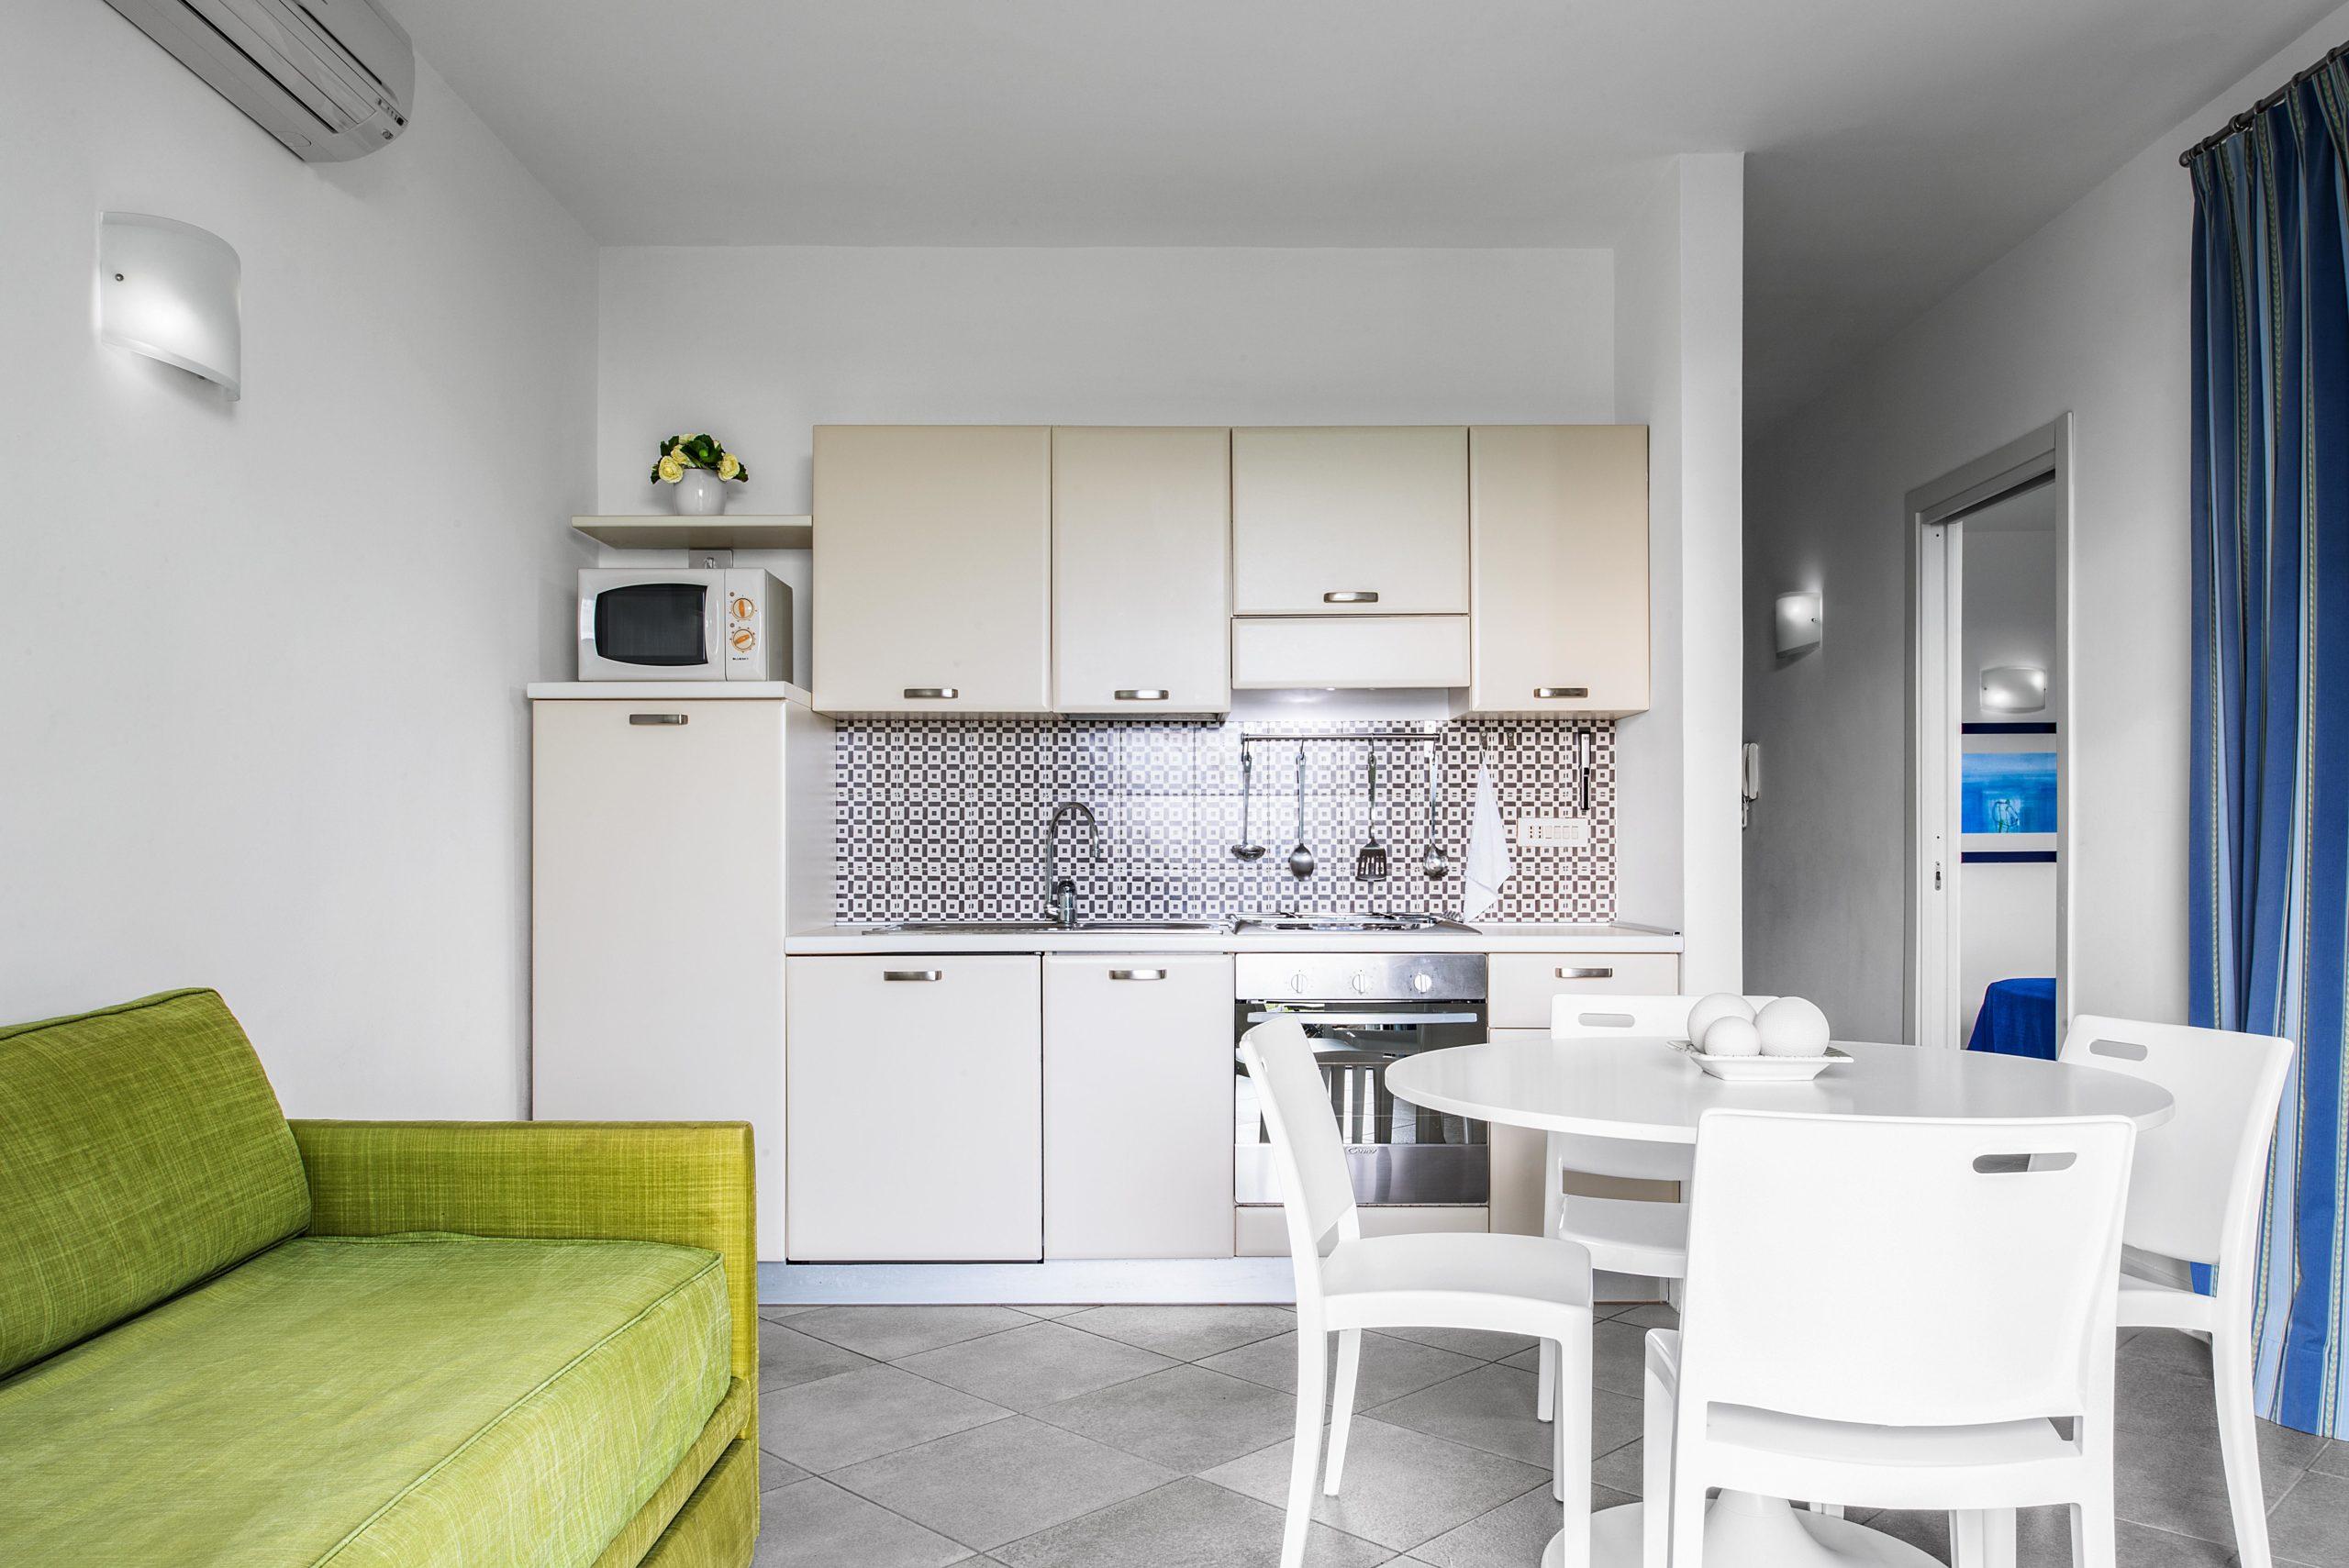 self catering apartment near sorrento, sleeps 4